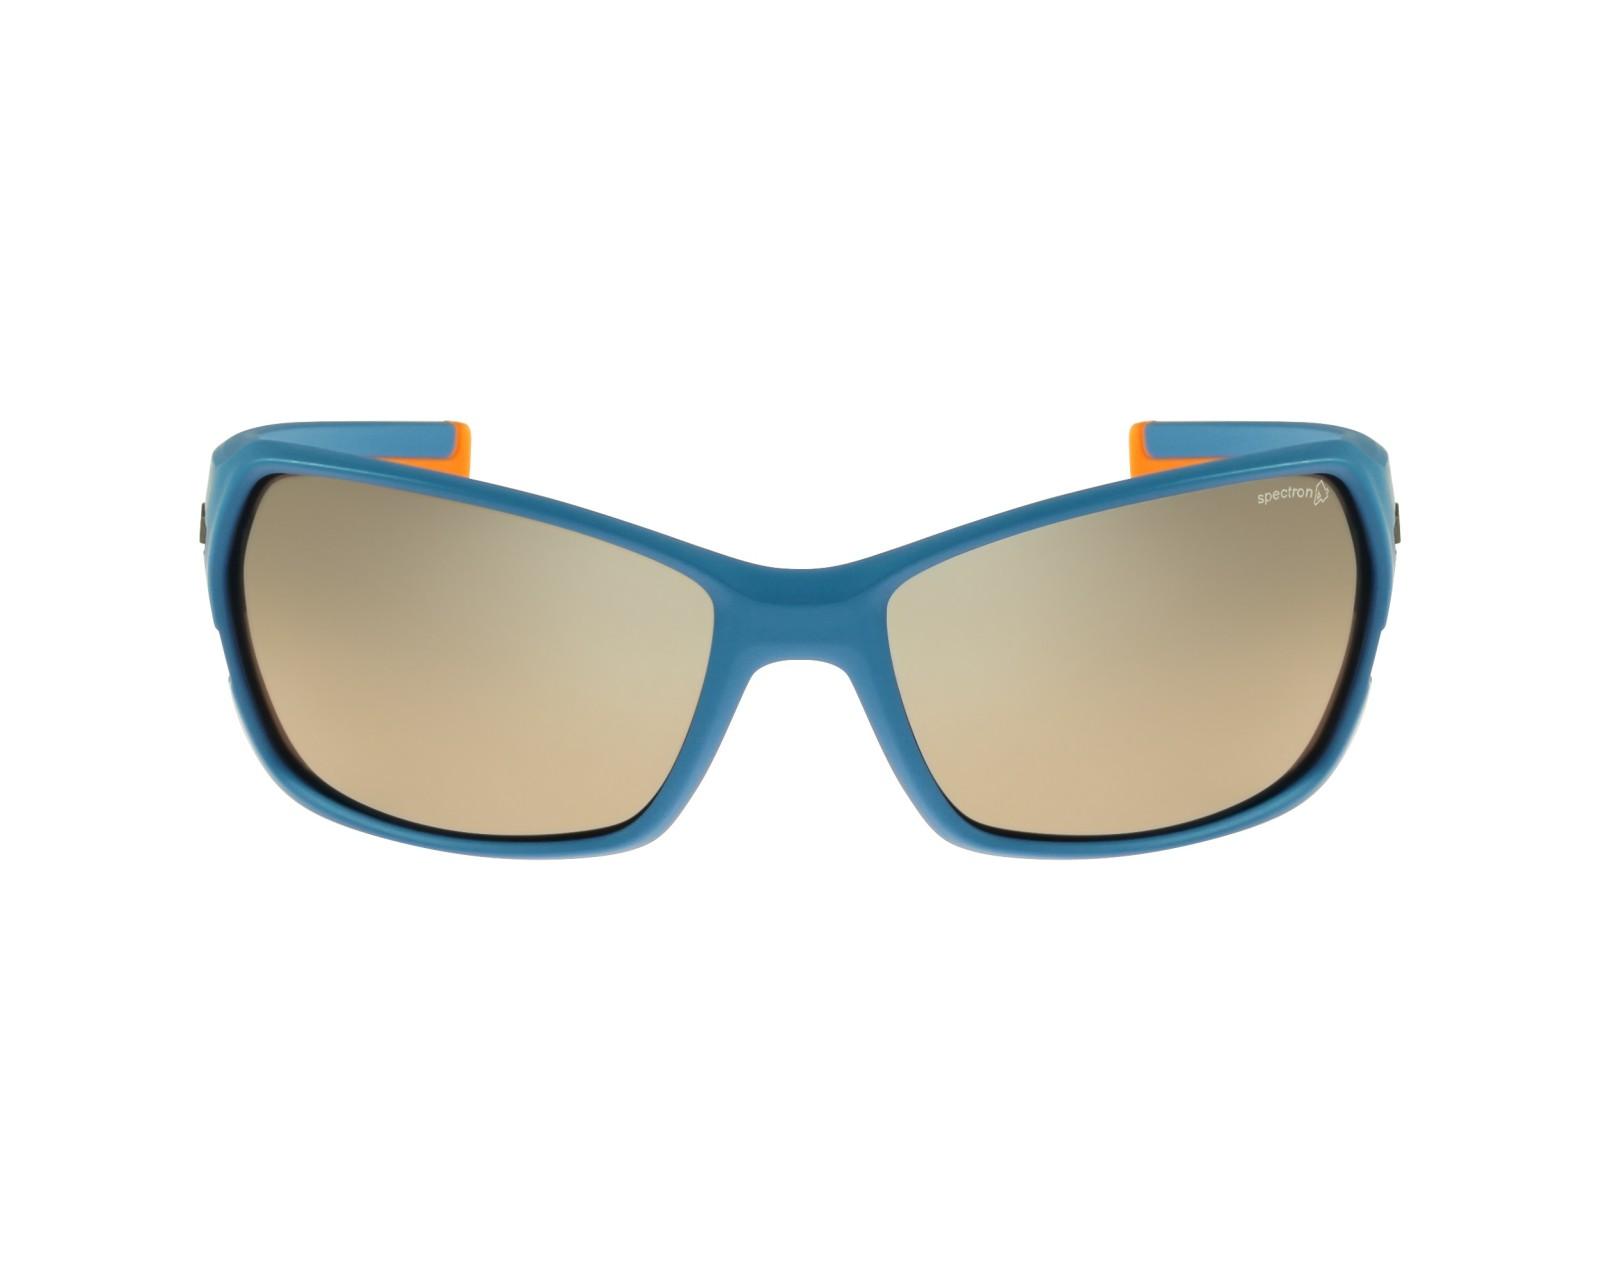 lunettes de soleil julbo j474 1212 bleu avec des verres marron. Black Bedroom Furniture Sets. Home Design Ideas